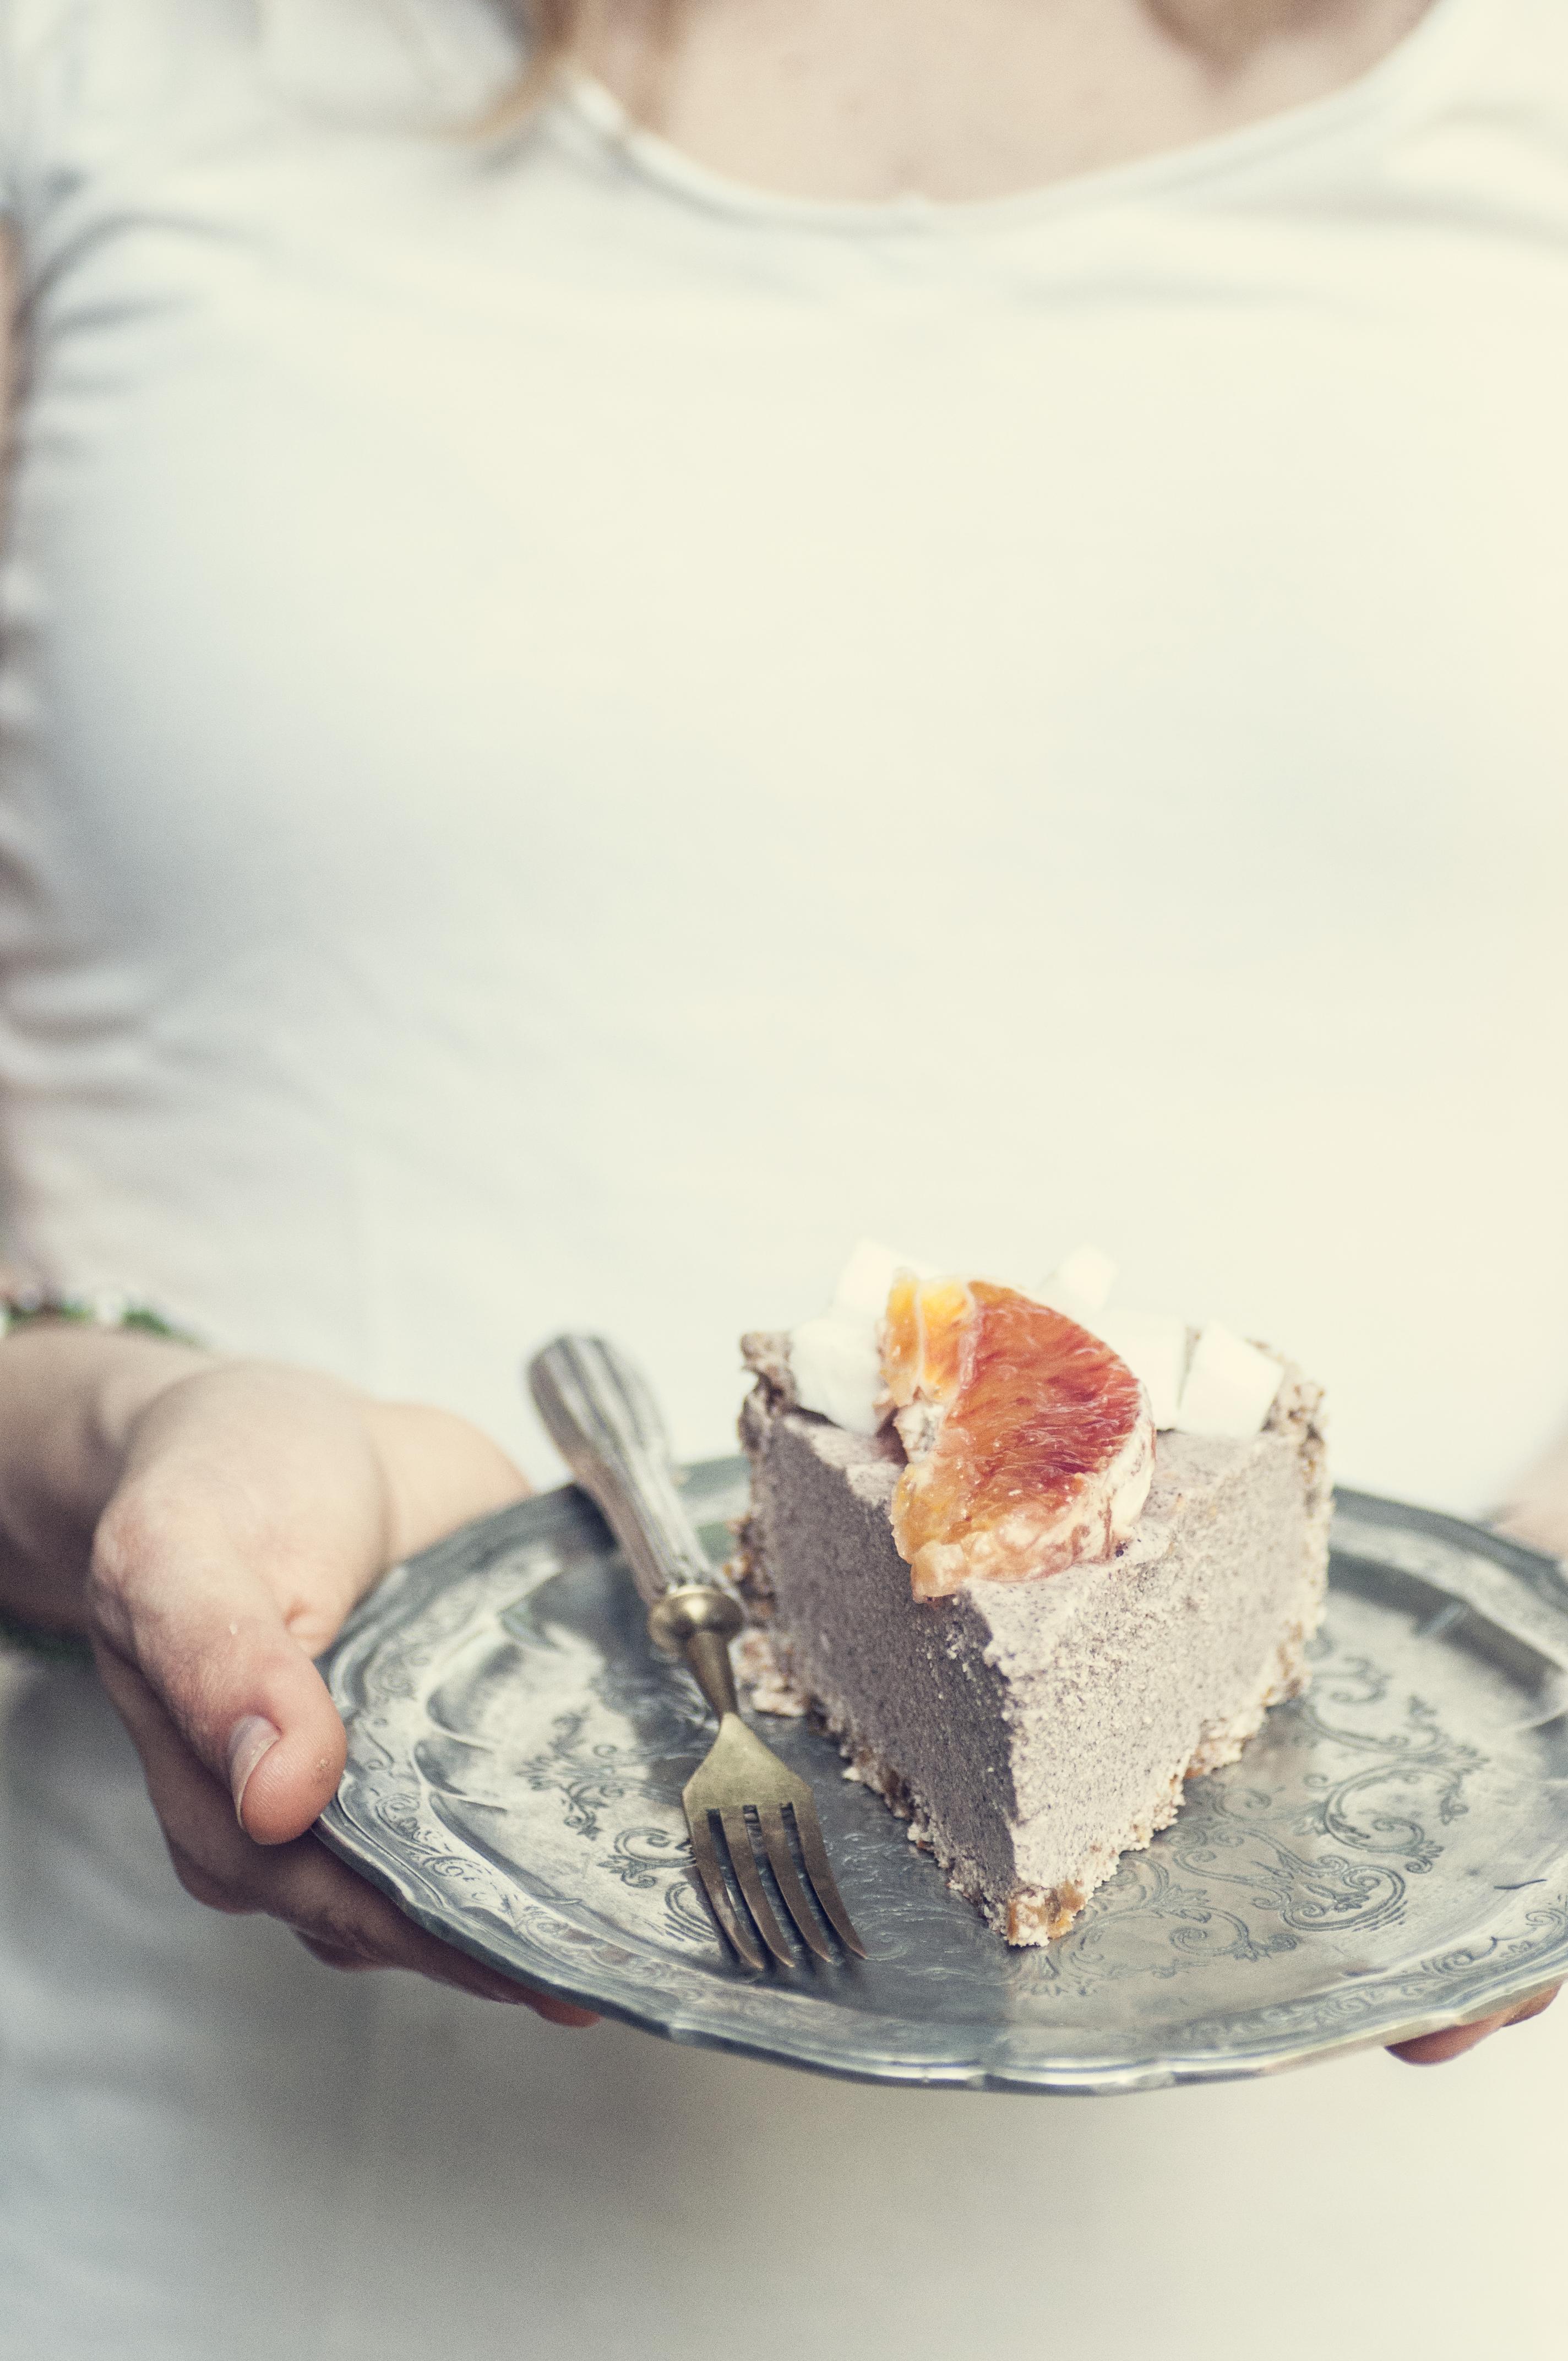 torta cruda 2